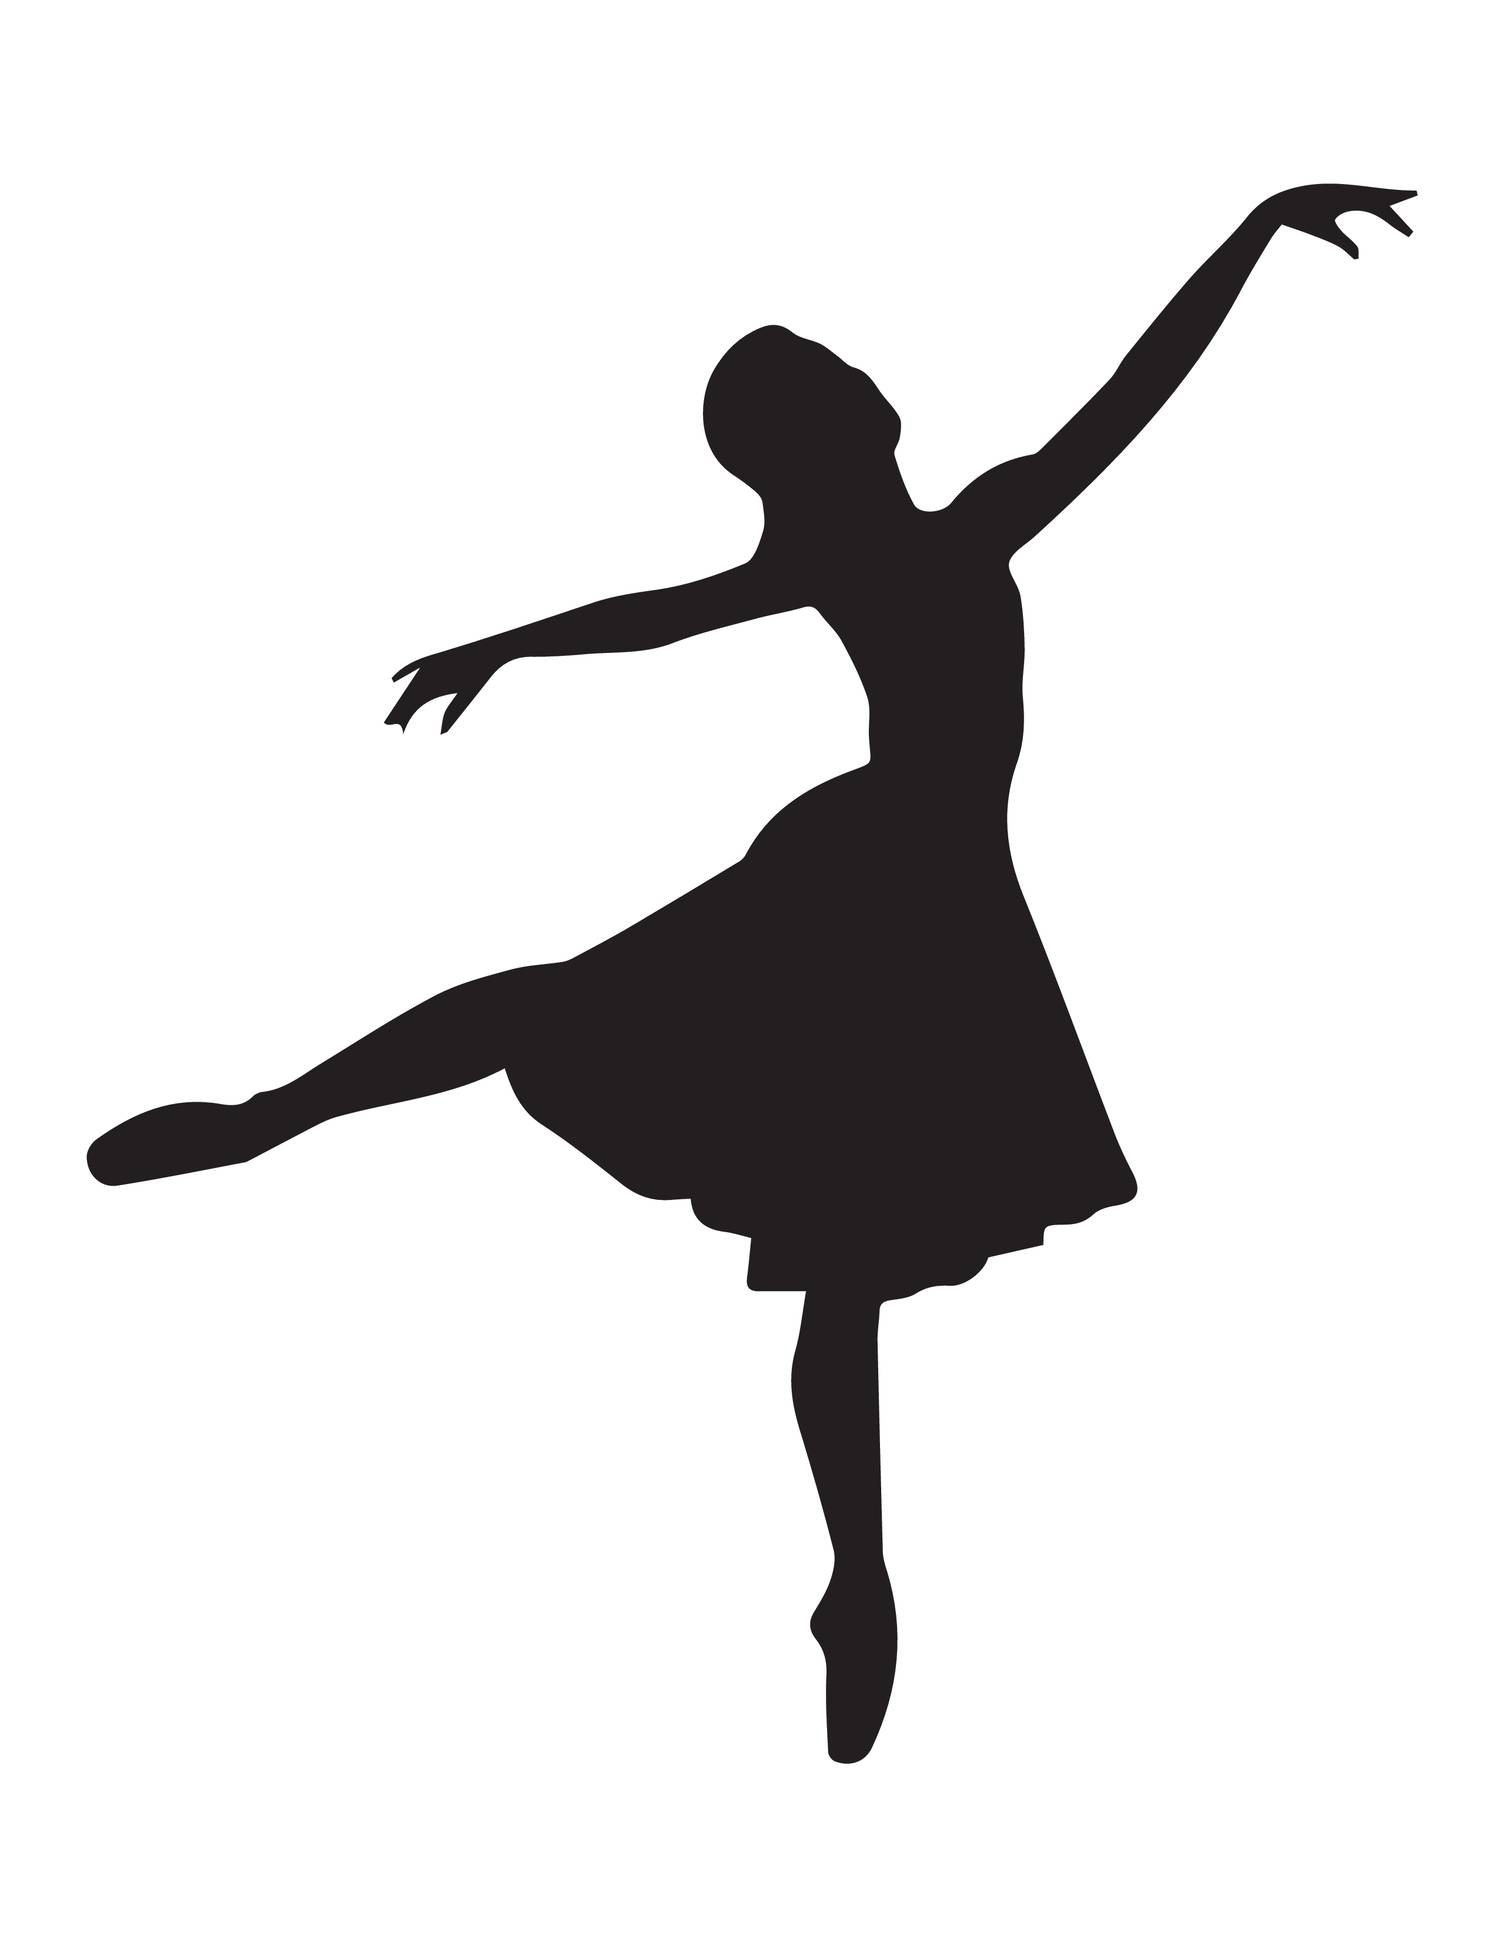 Www Docdroid Net File View Uoqyc5s Ballet Dance